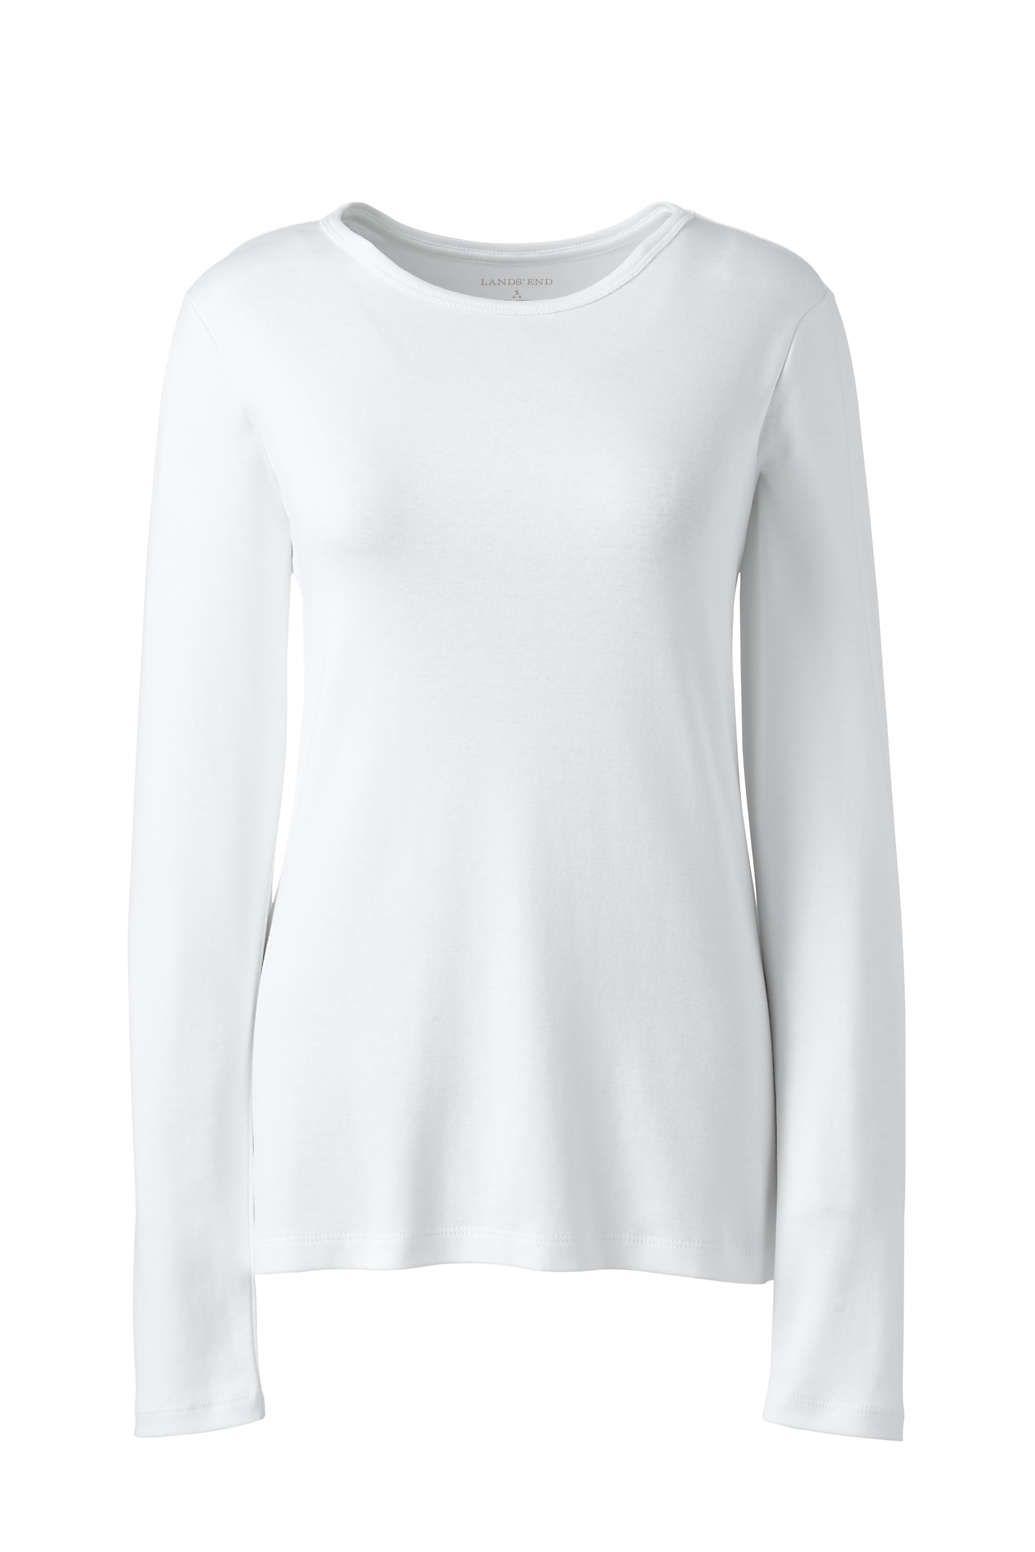 Lands End Womens All Cotton Long Sleeve Crewneck T-Shirt